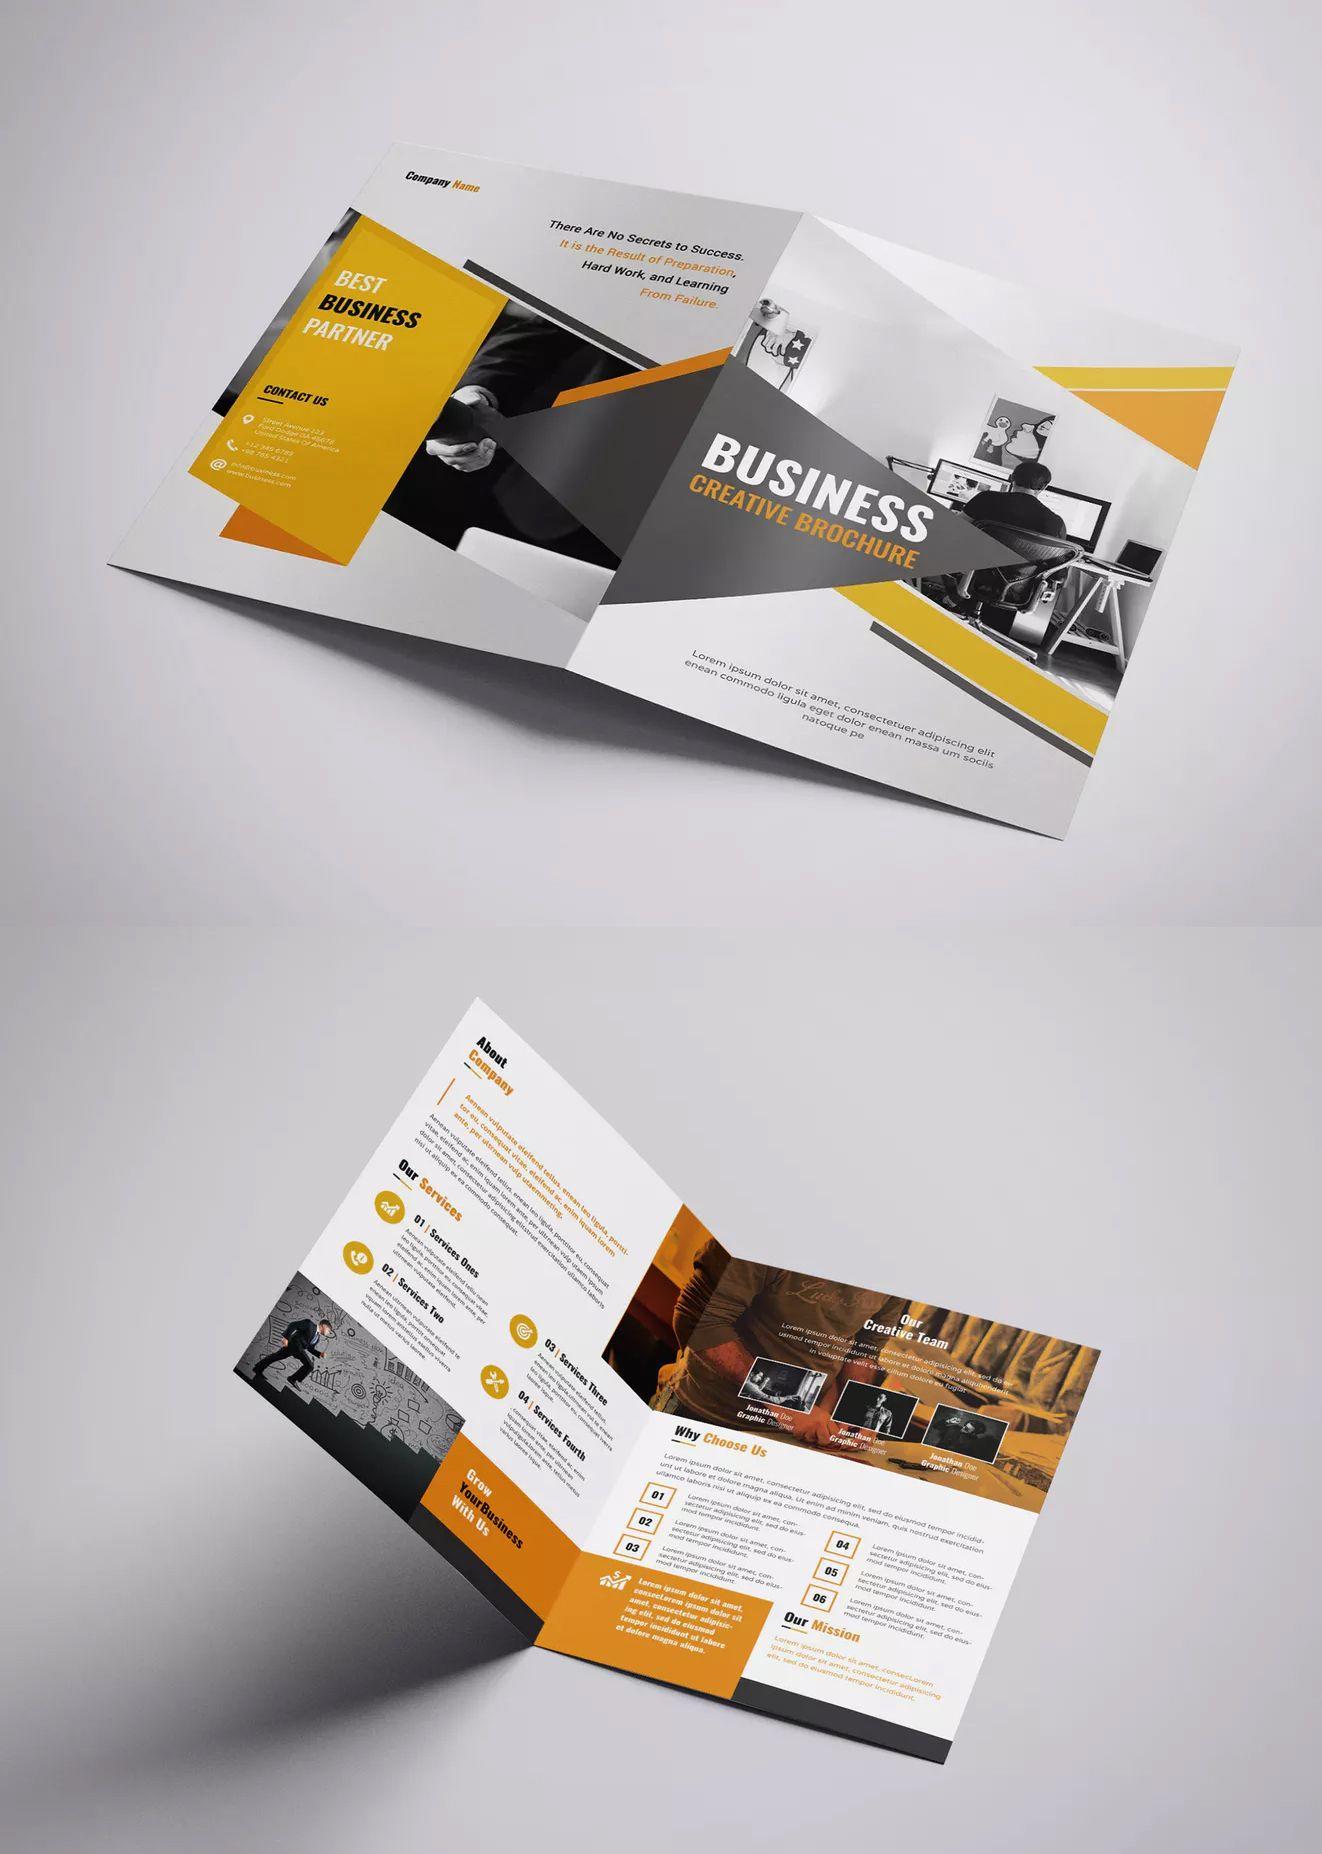 Business Creative Bi Fold Brochure Template Psd Bi Fold Brochure